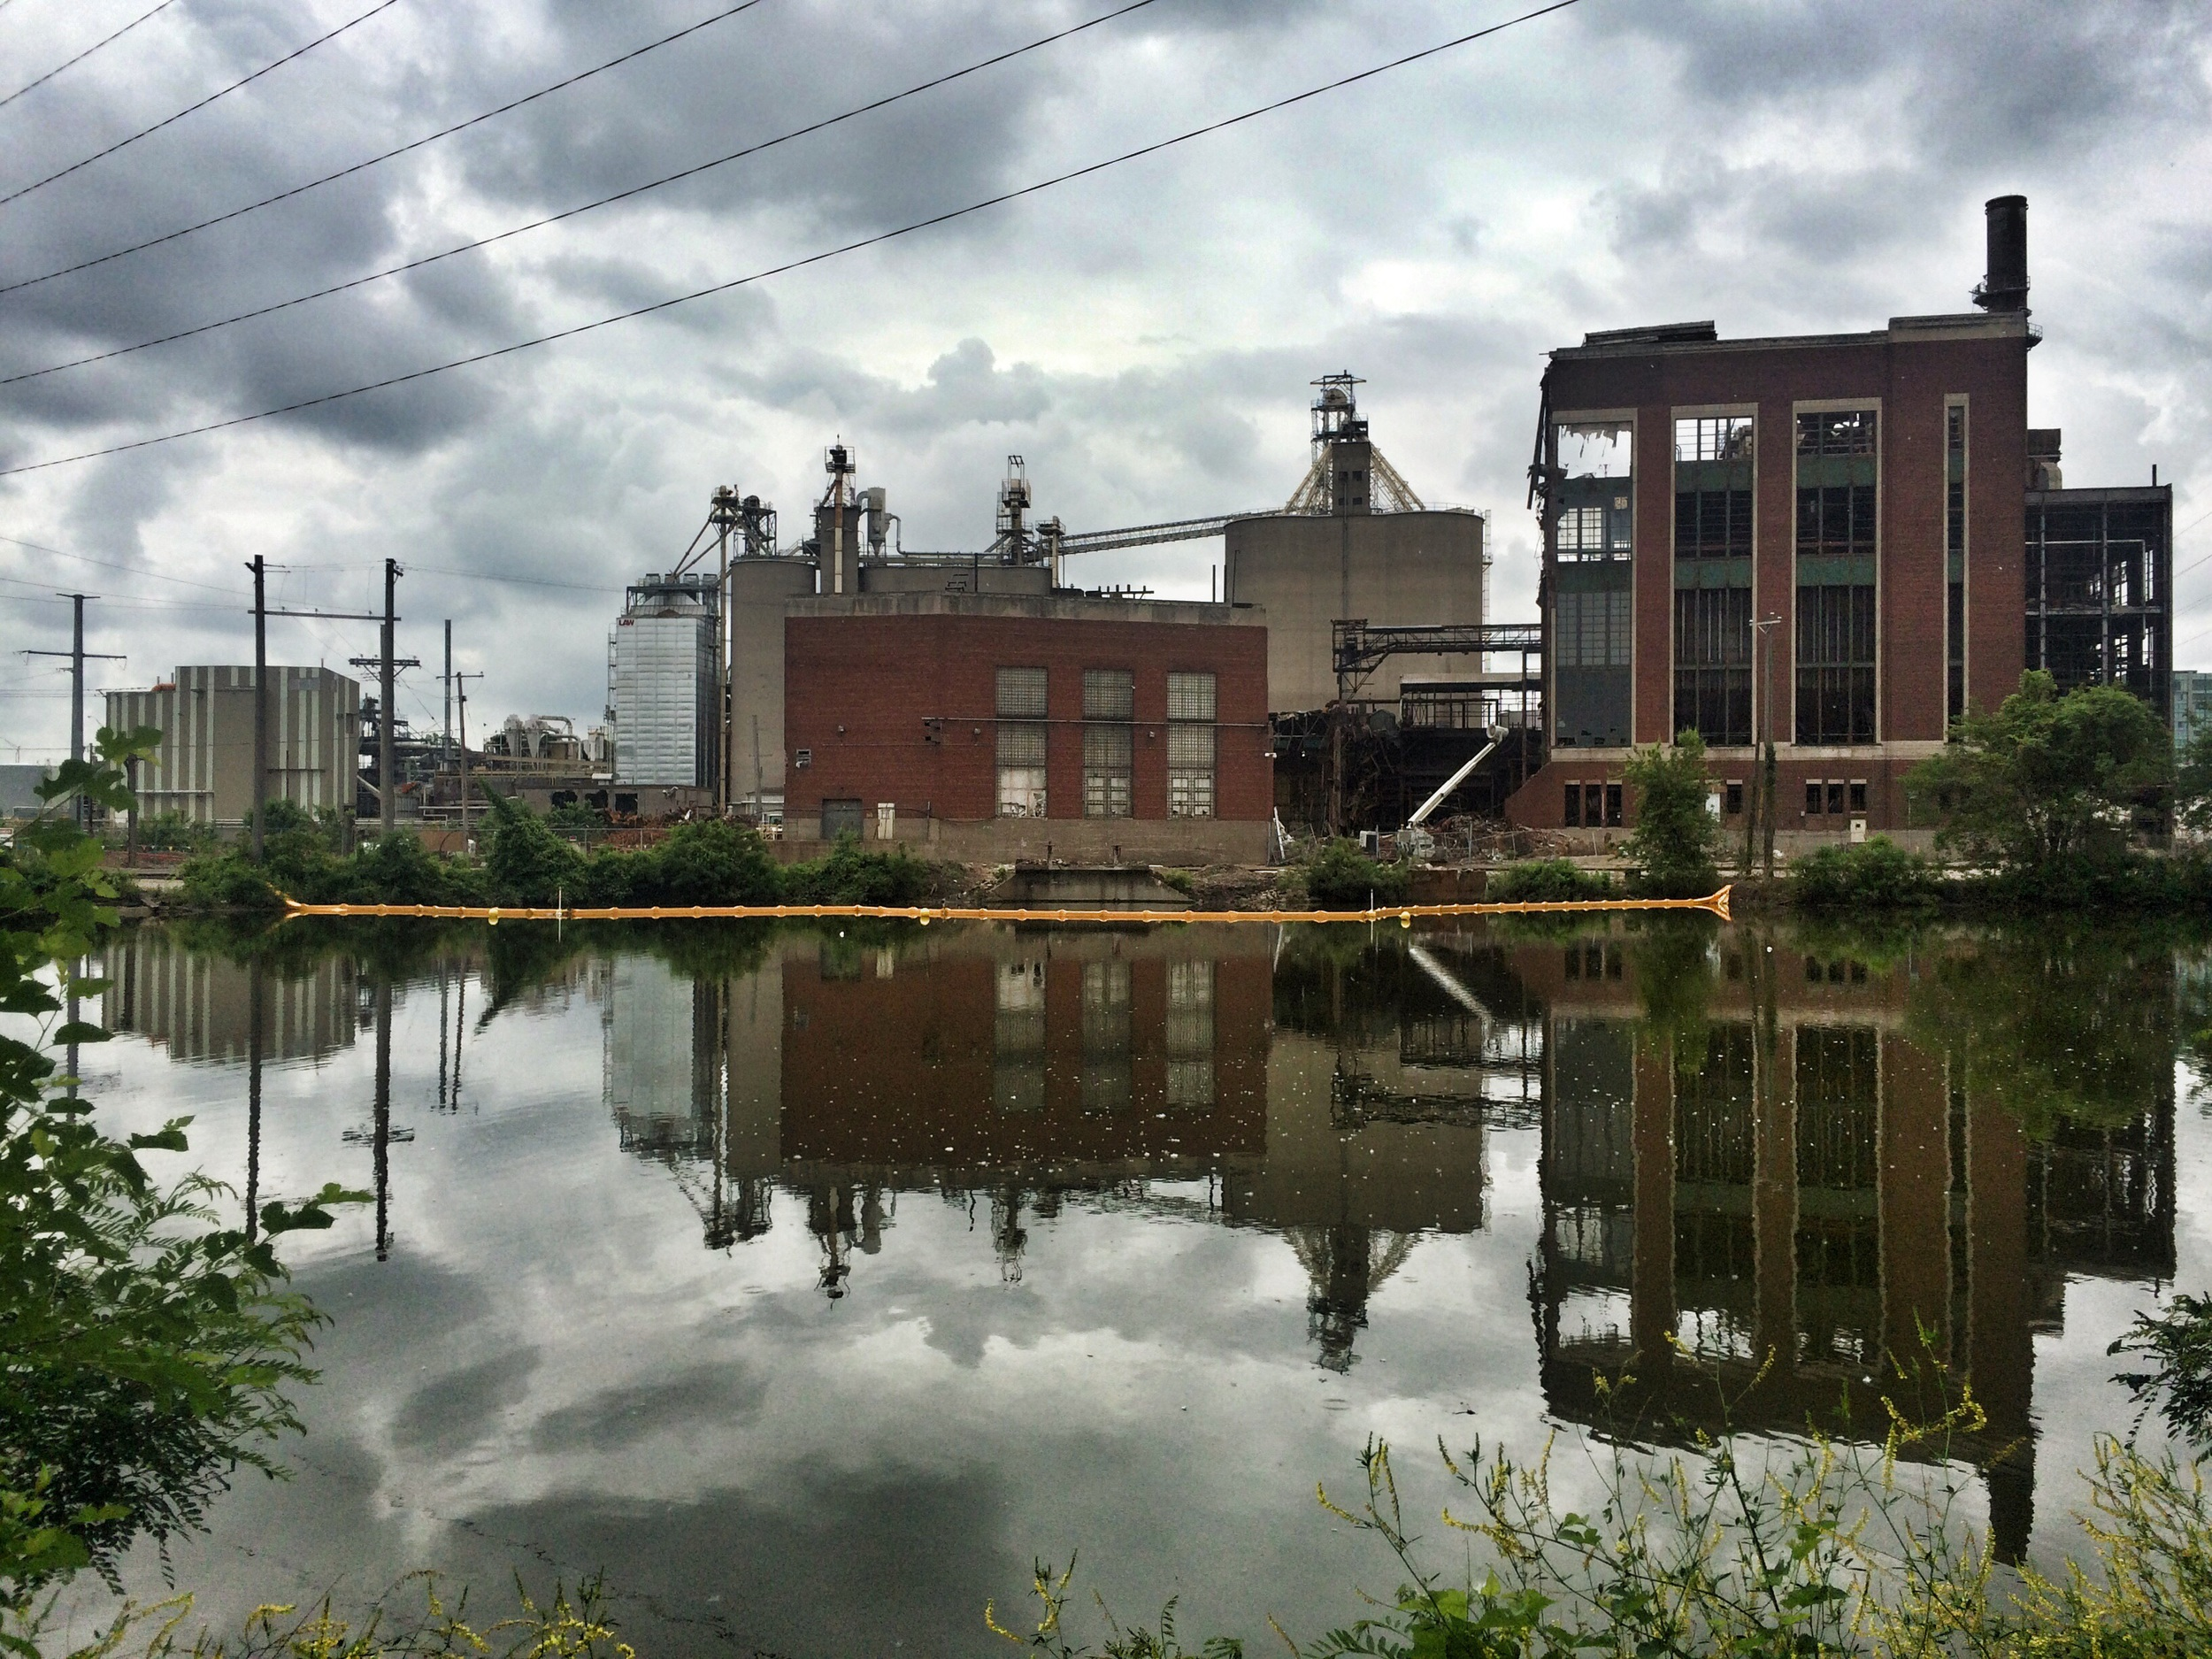 Post apocalypse industry in Cedar Rapids